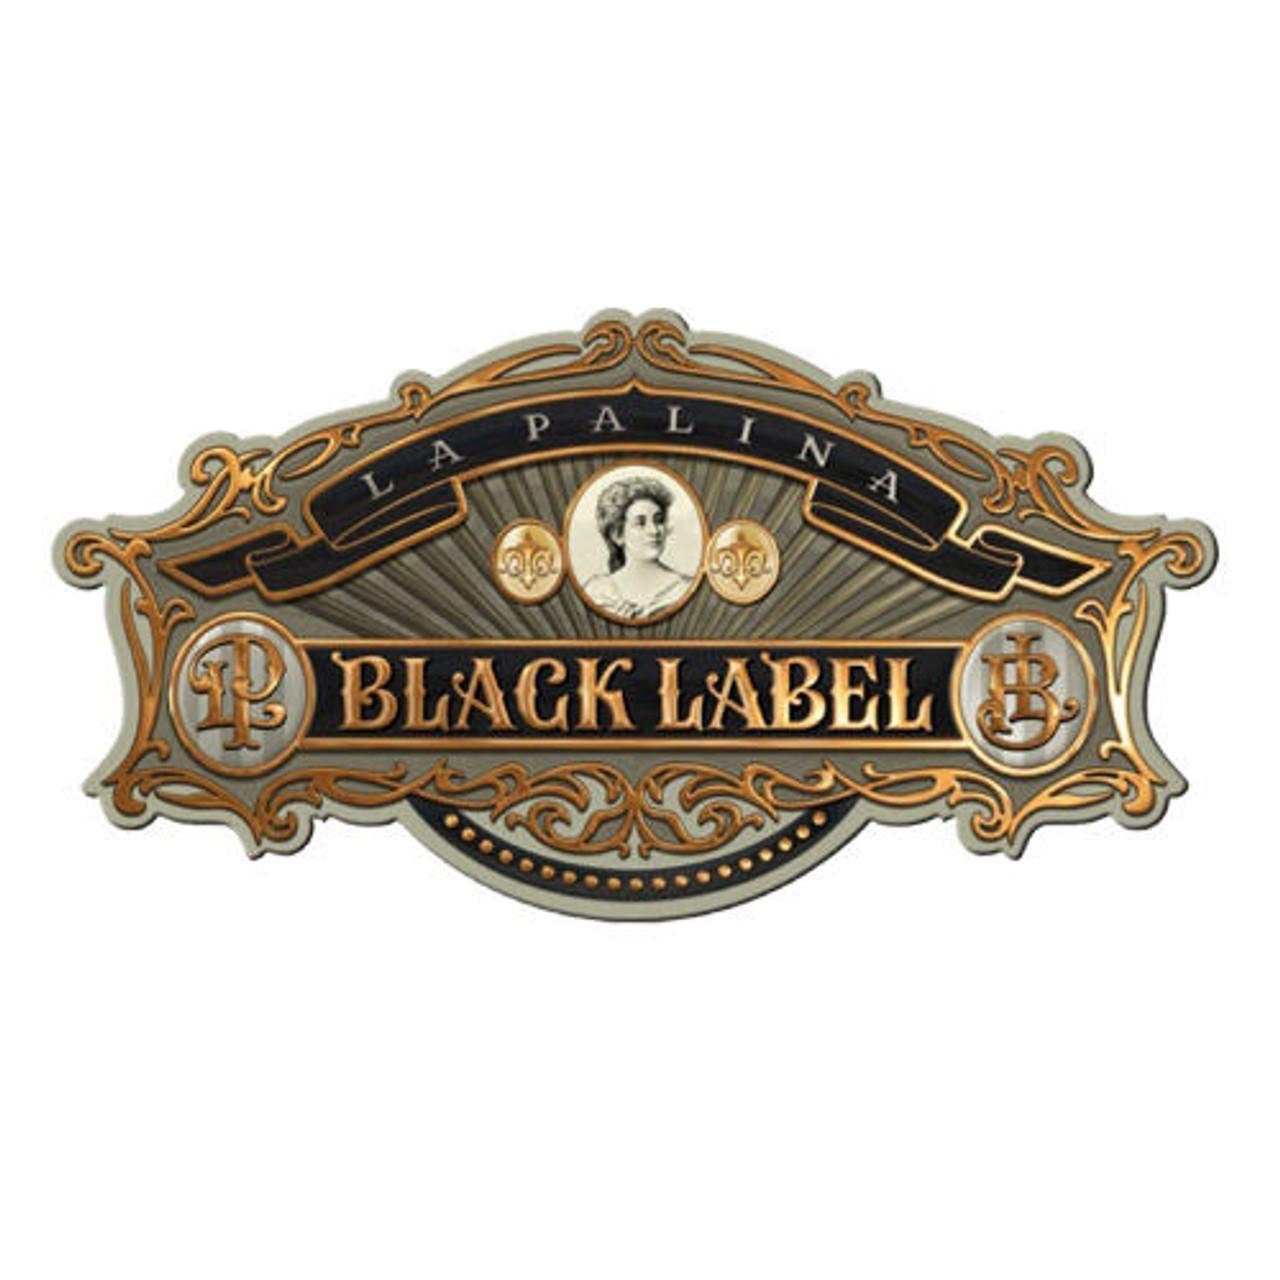 La Palina Black Label Toro Cigars - 6 x 50 (Pack of 5)